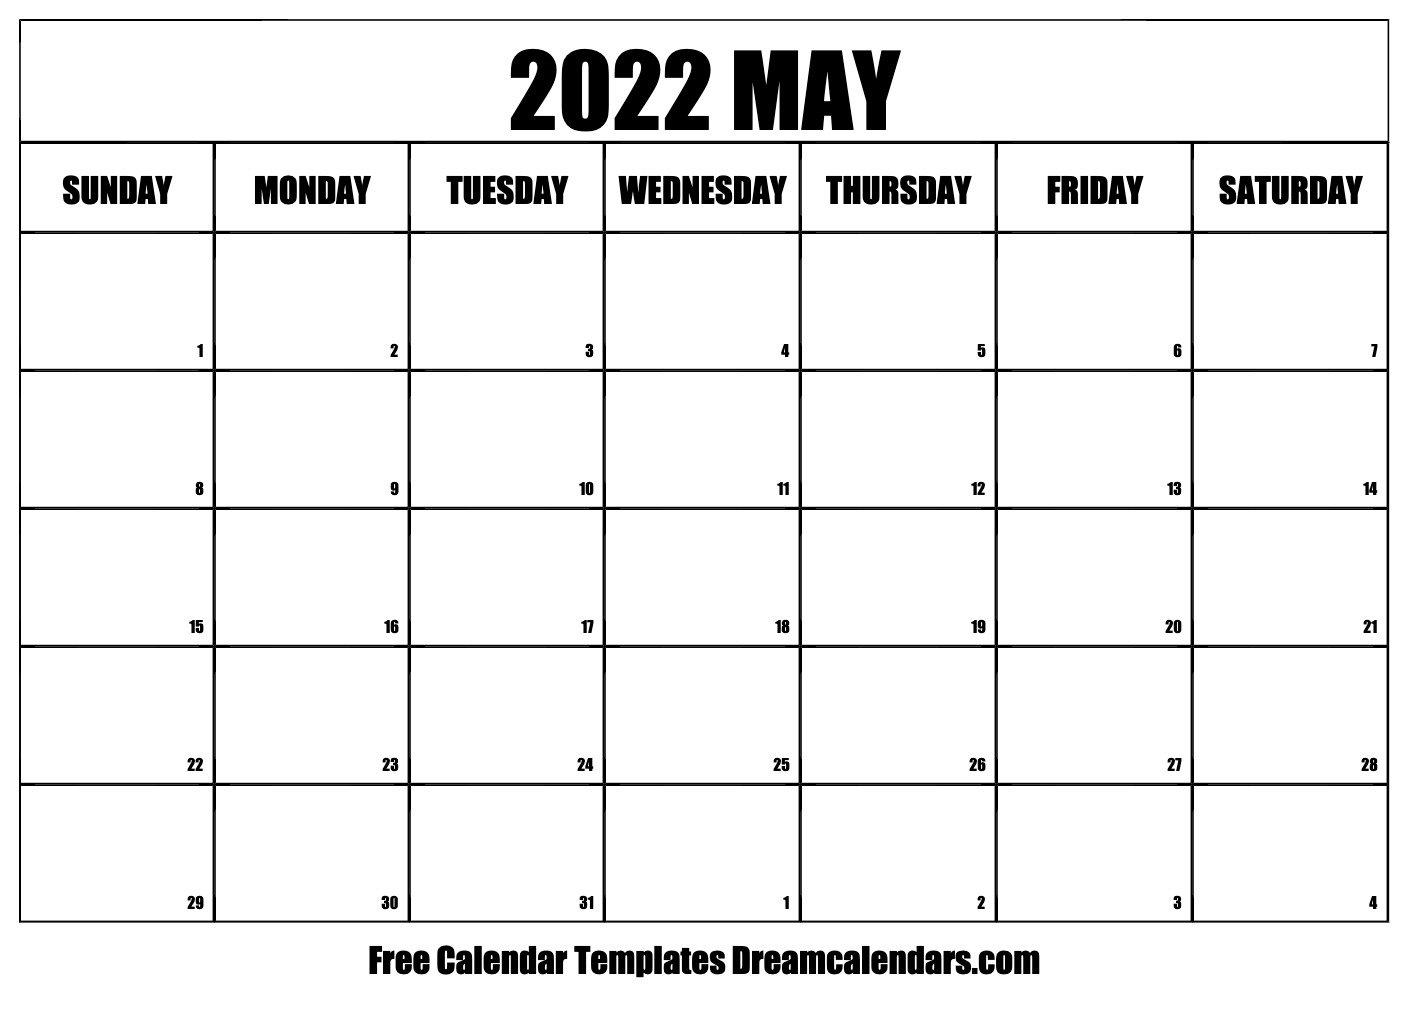 May 2022 Calendar   Free Blank Printable Templates regarding Free Printable Printable Pdf January 2022 Calendar